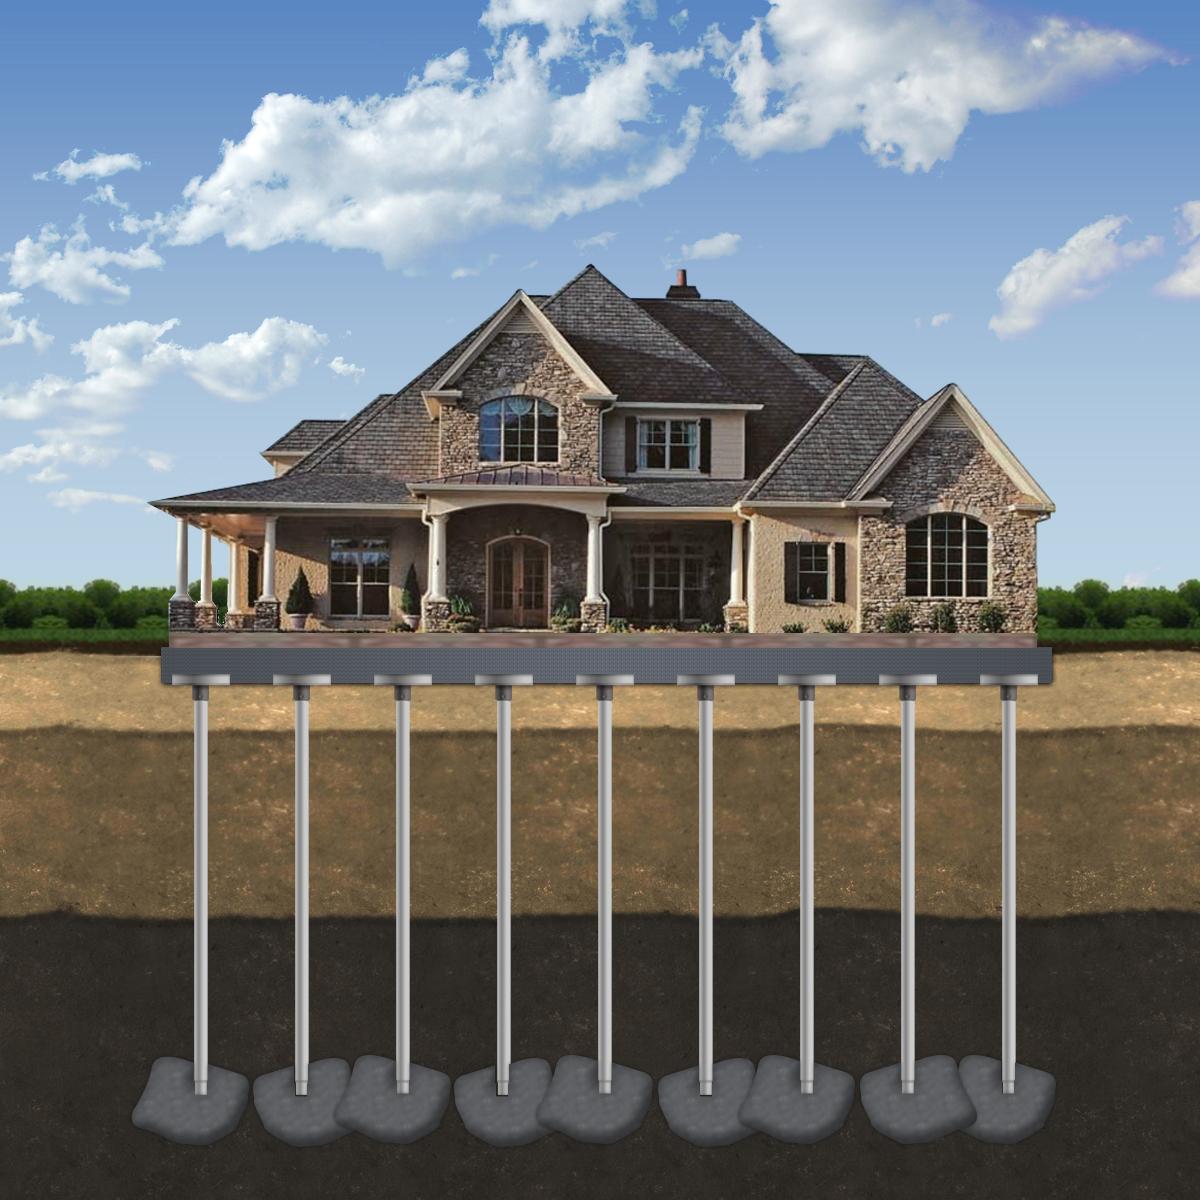 Soil Compaction Methods